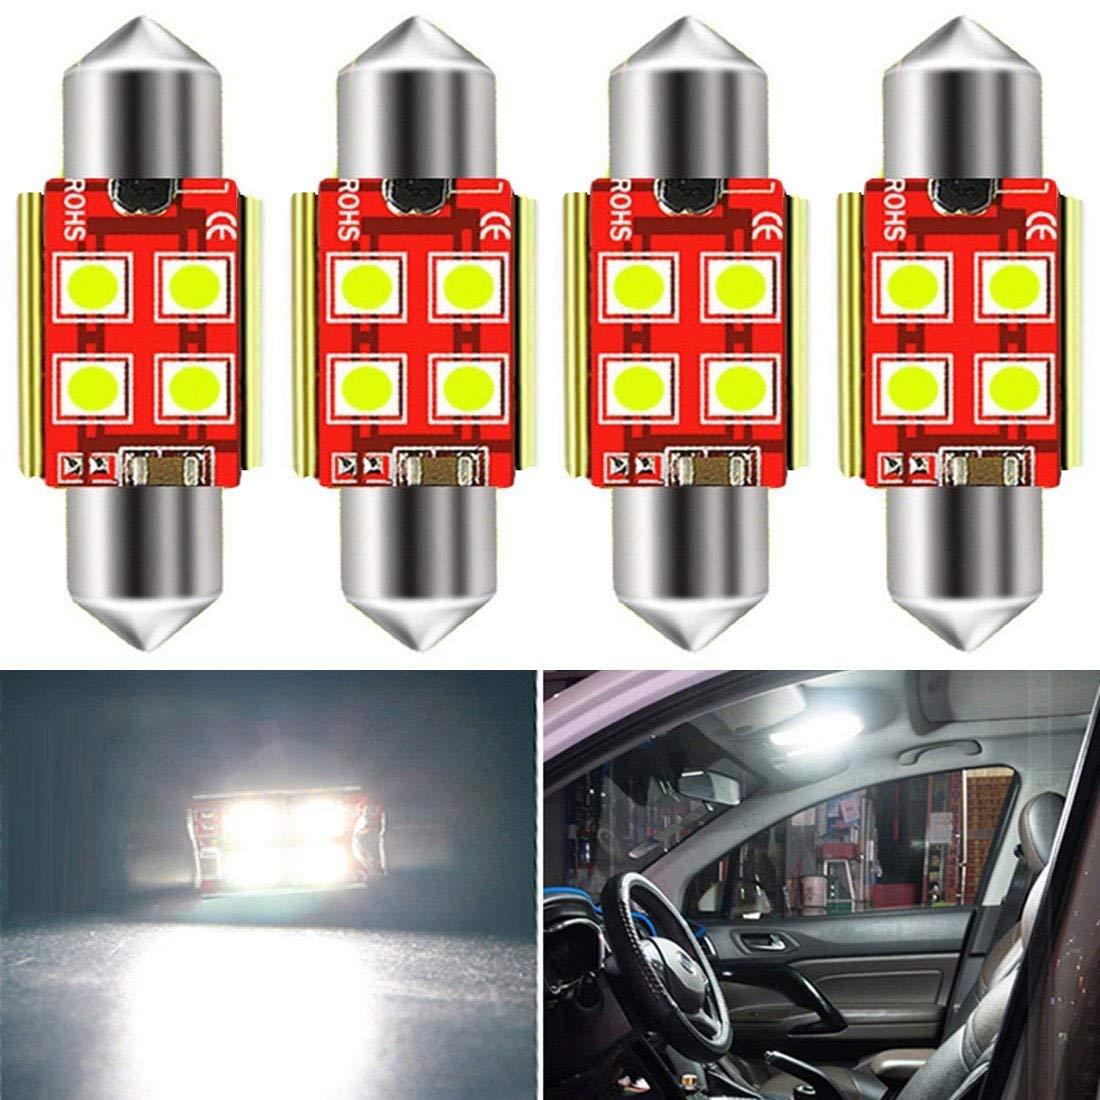 10pcs Car RV Interior Festoon Dome Lamp Bulbs 12V 5050 31mm 4SMD LED White Light